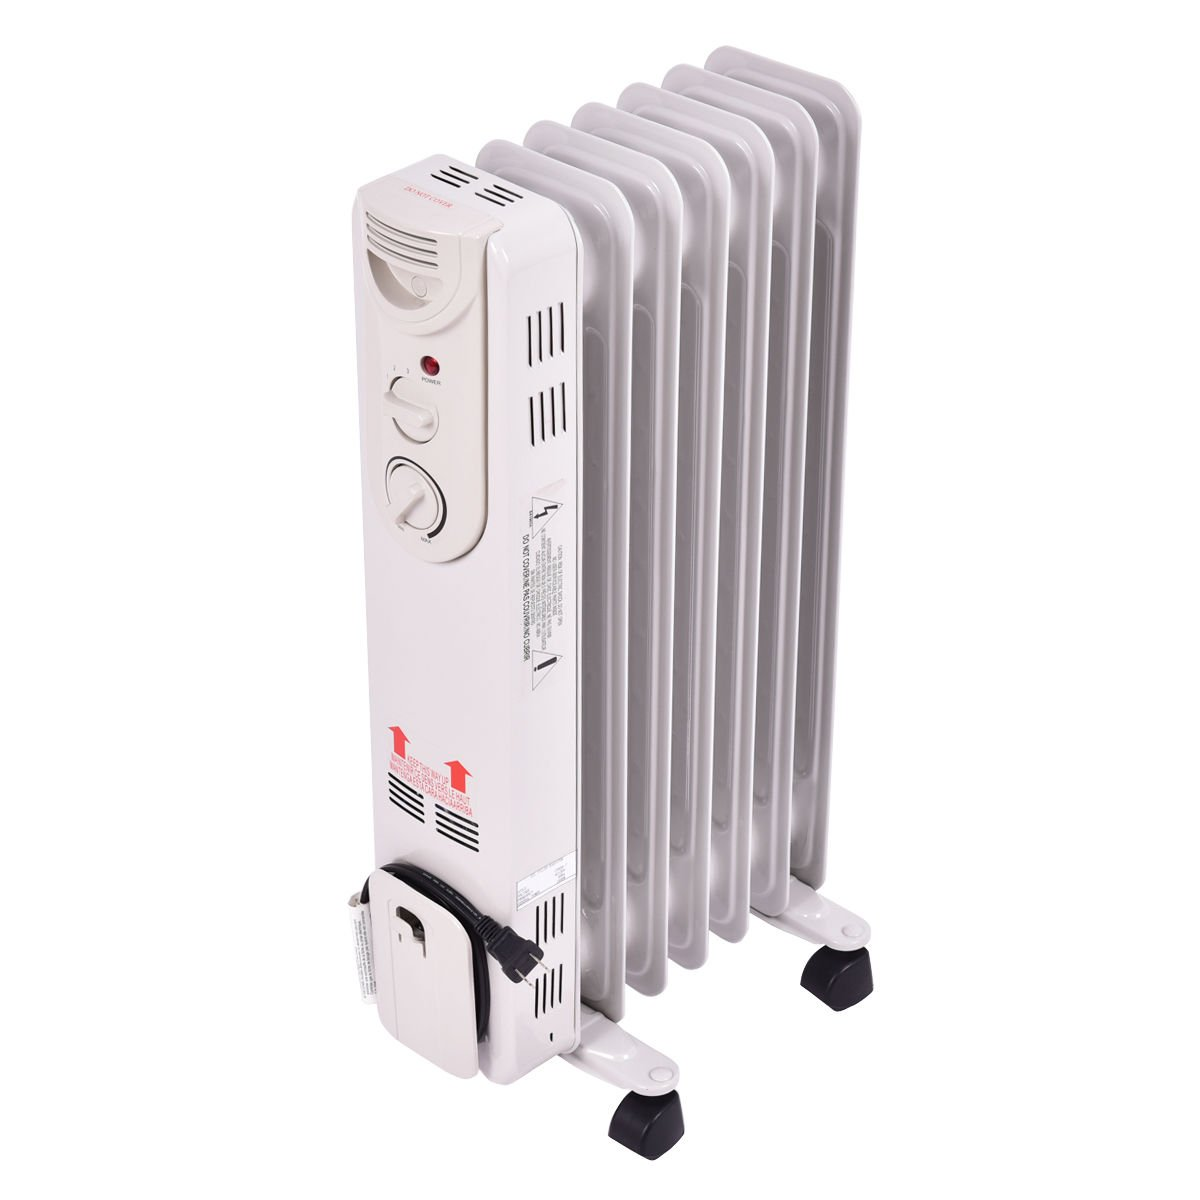 Amazon.com: Tangkula Electric Oil Filled Radiator Heater Portable ...